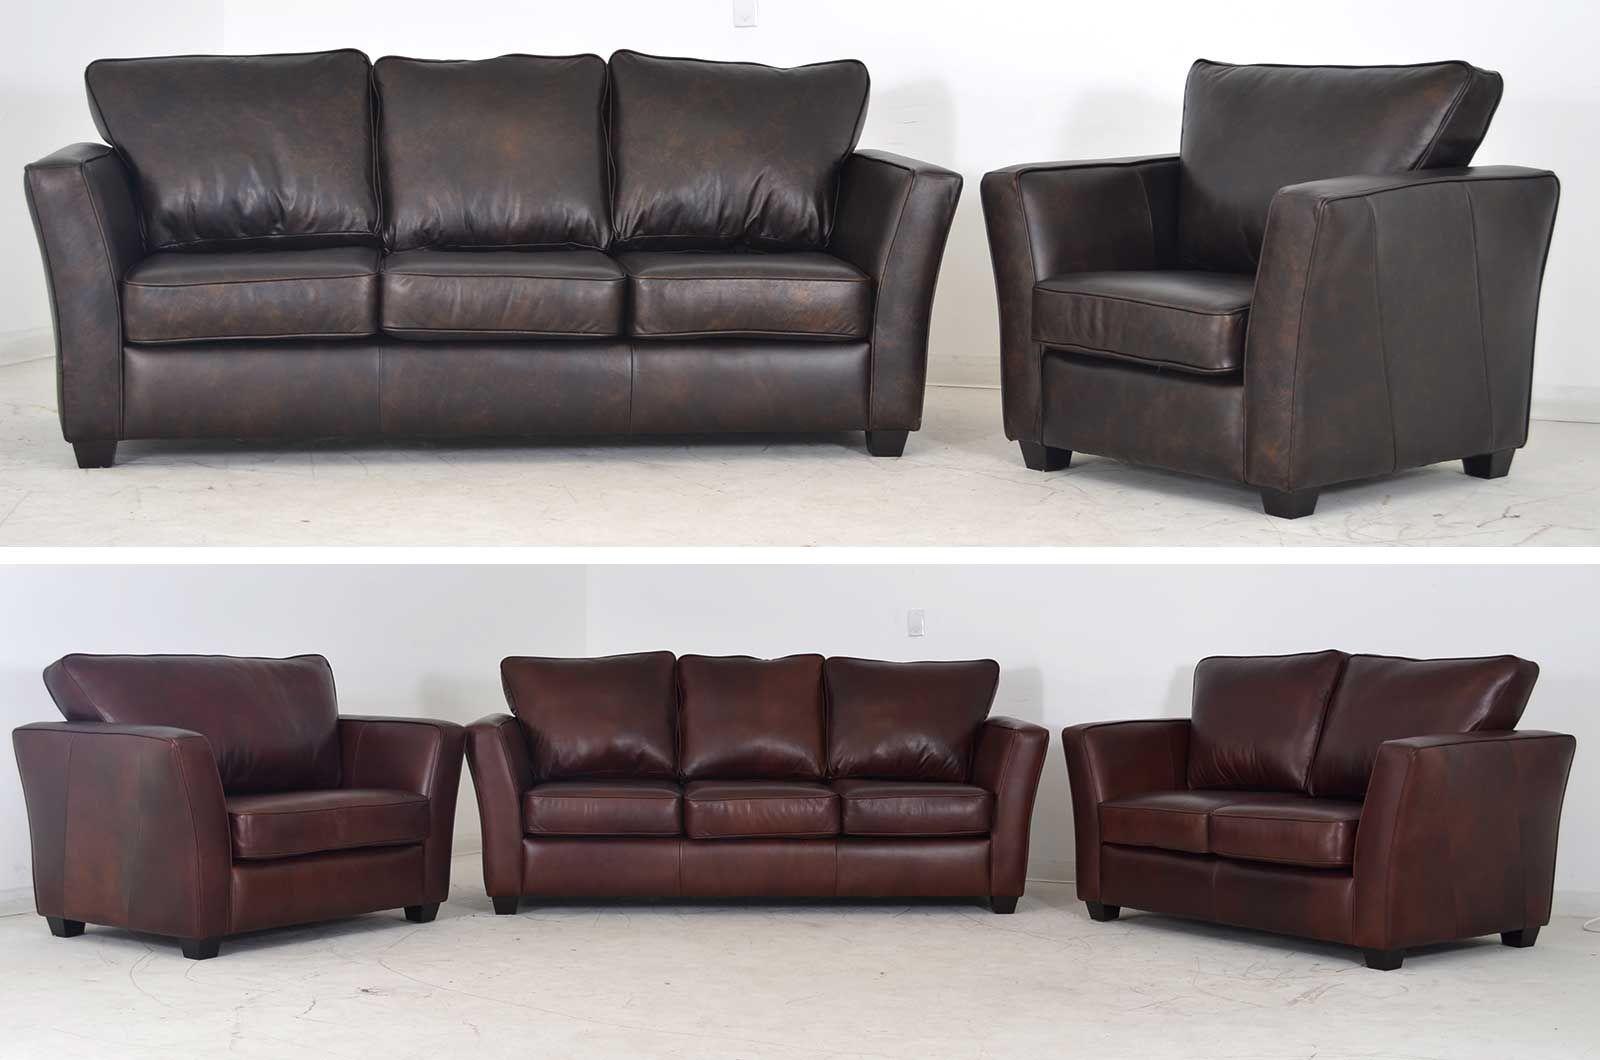 Barrington Sofa The Leather Sofa Company With Images Sofa Company Sofa Leather Furniture